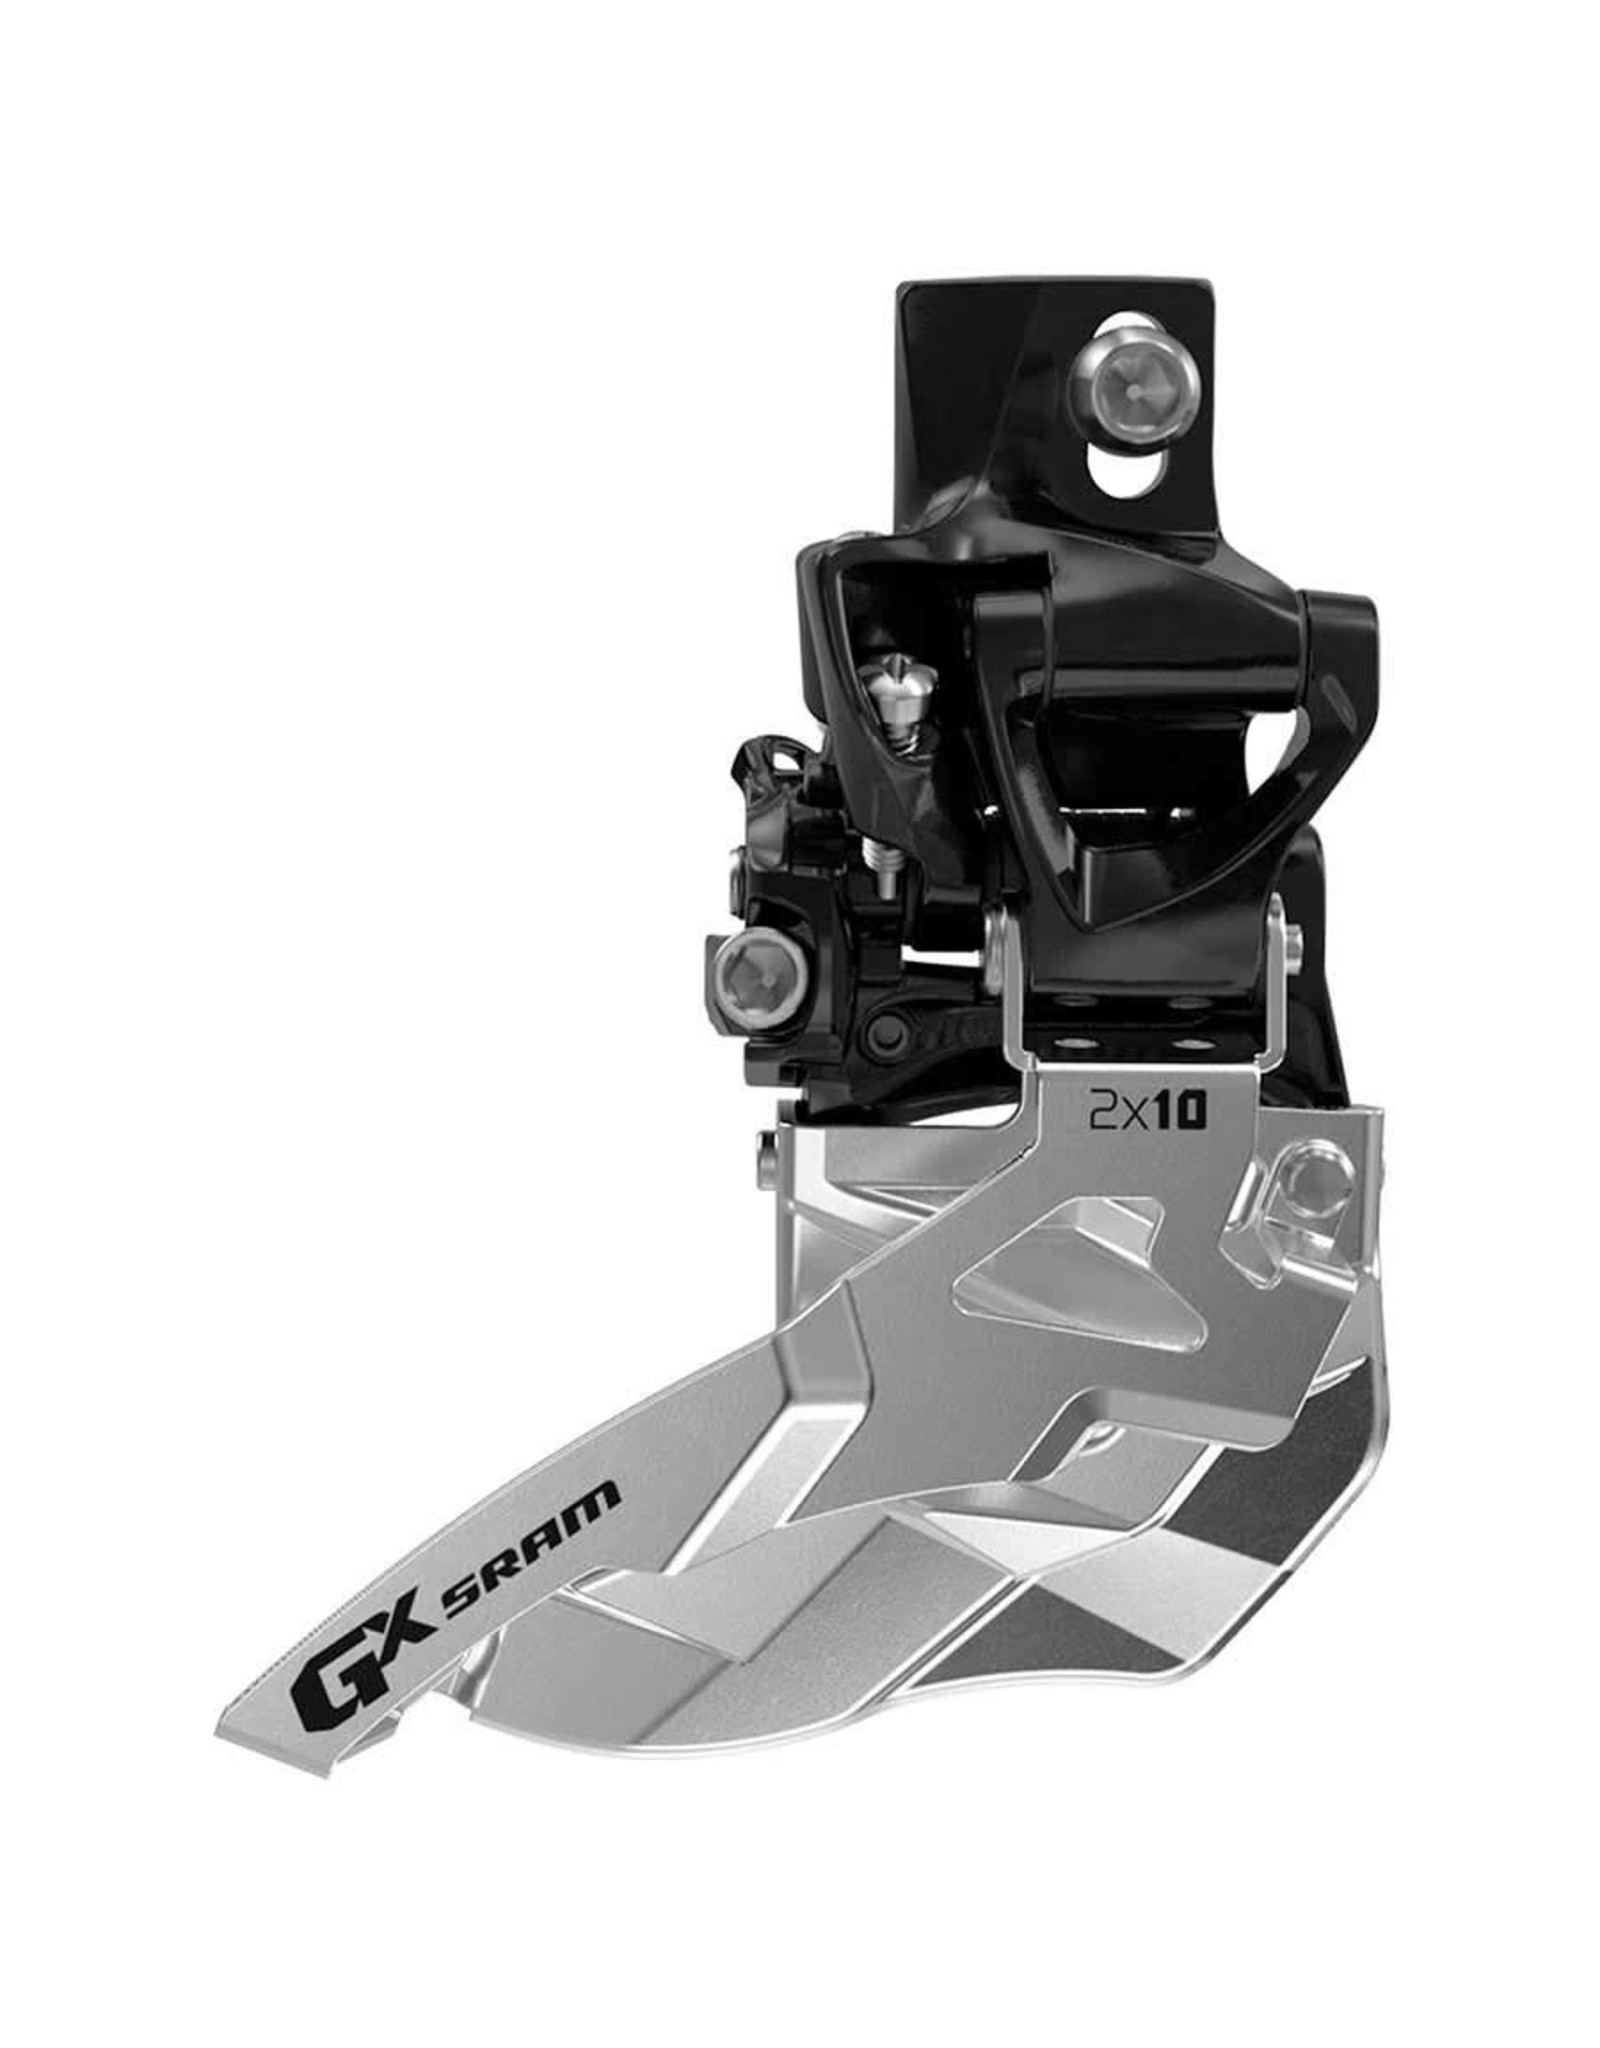 SRAM Sram -  GX 2x10, Front derailleur, 2X10sp, Top Swing, Dual Pull, Direct Clamp,